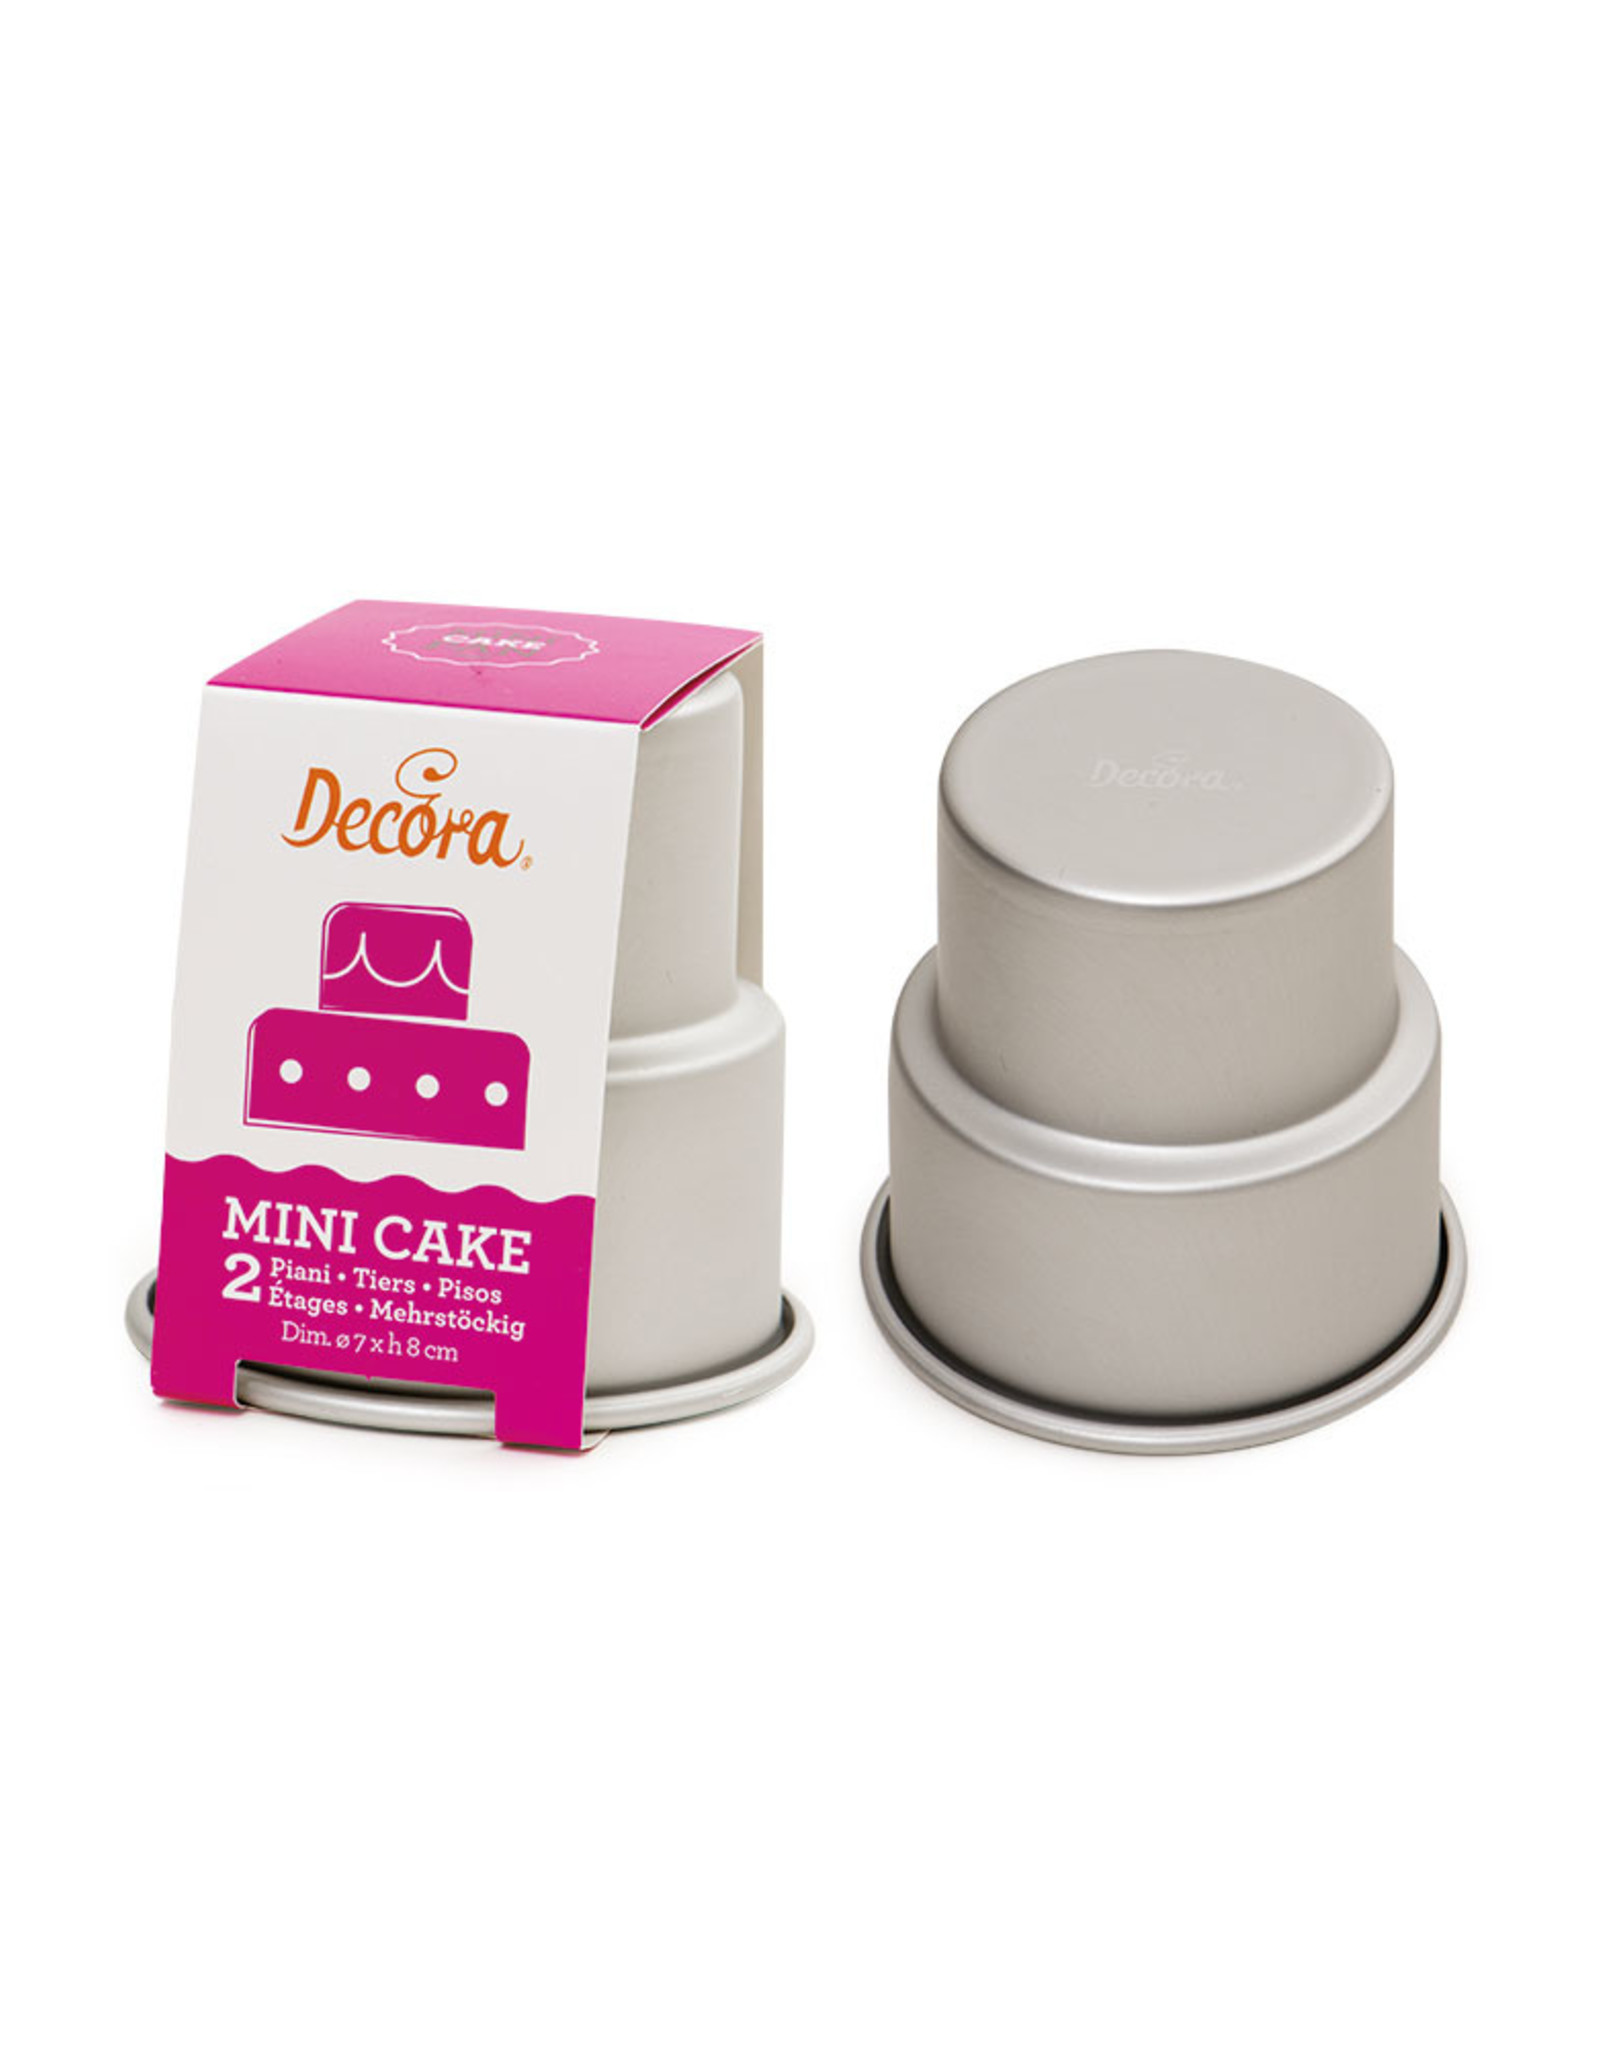 Decora Decora Mini Wedding Cake 2-laags